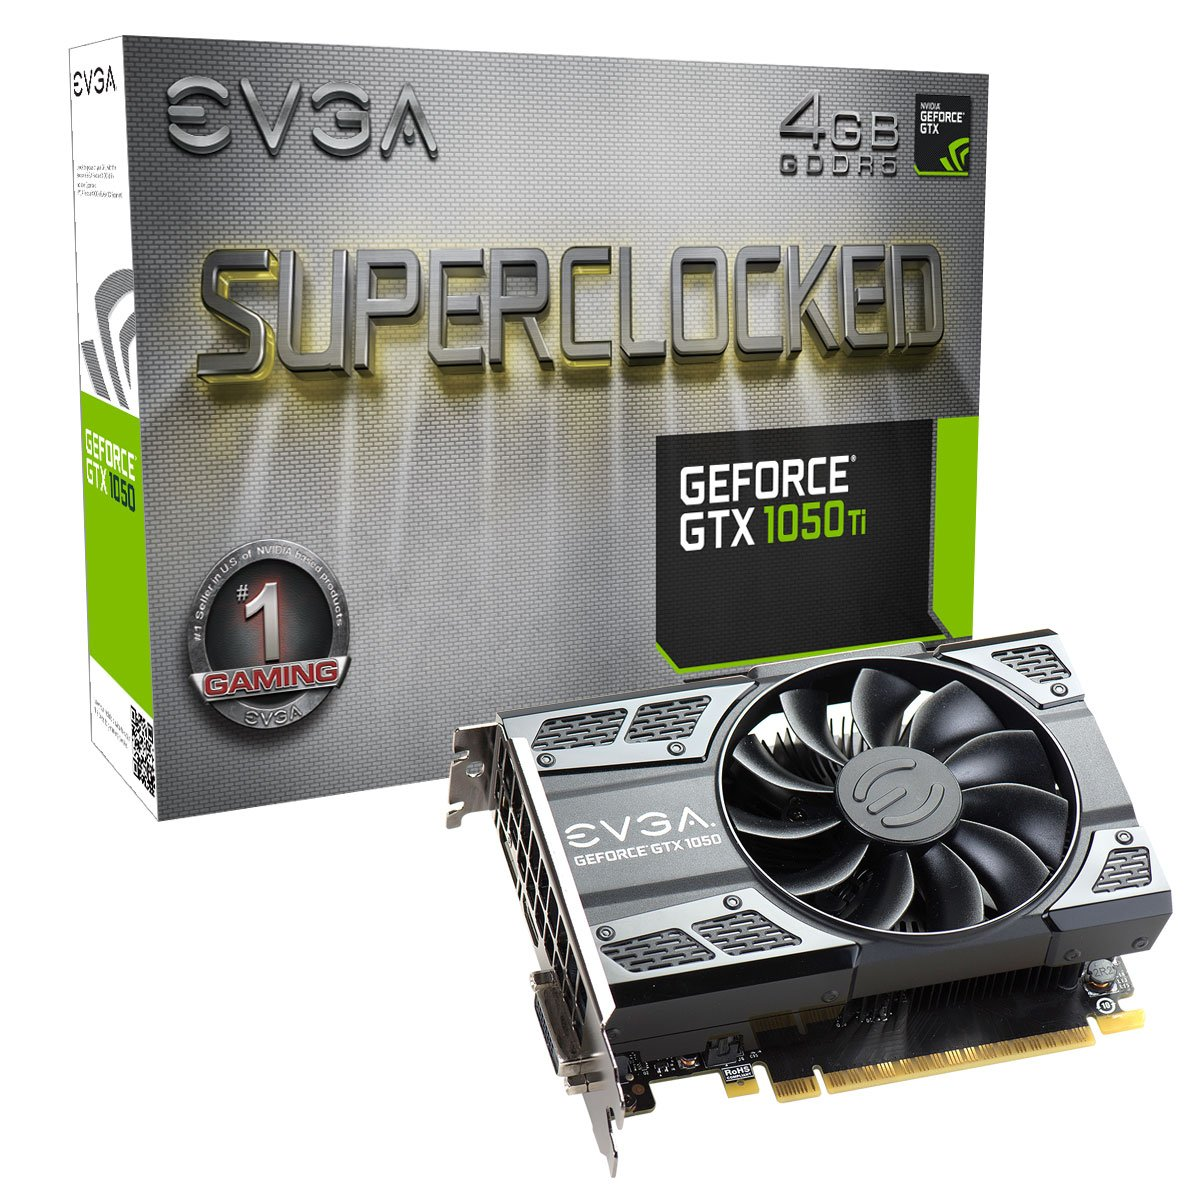 EVGA GeForce GTX 1050 Ti SC Gaming Graphics Card